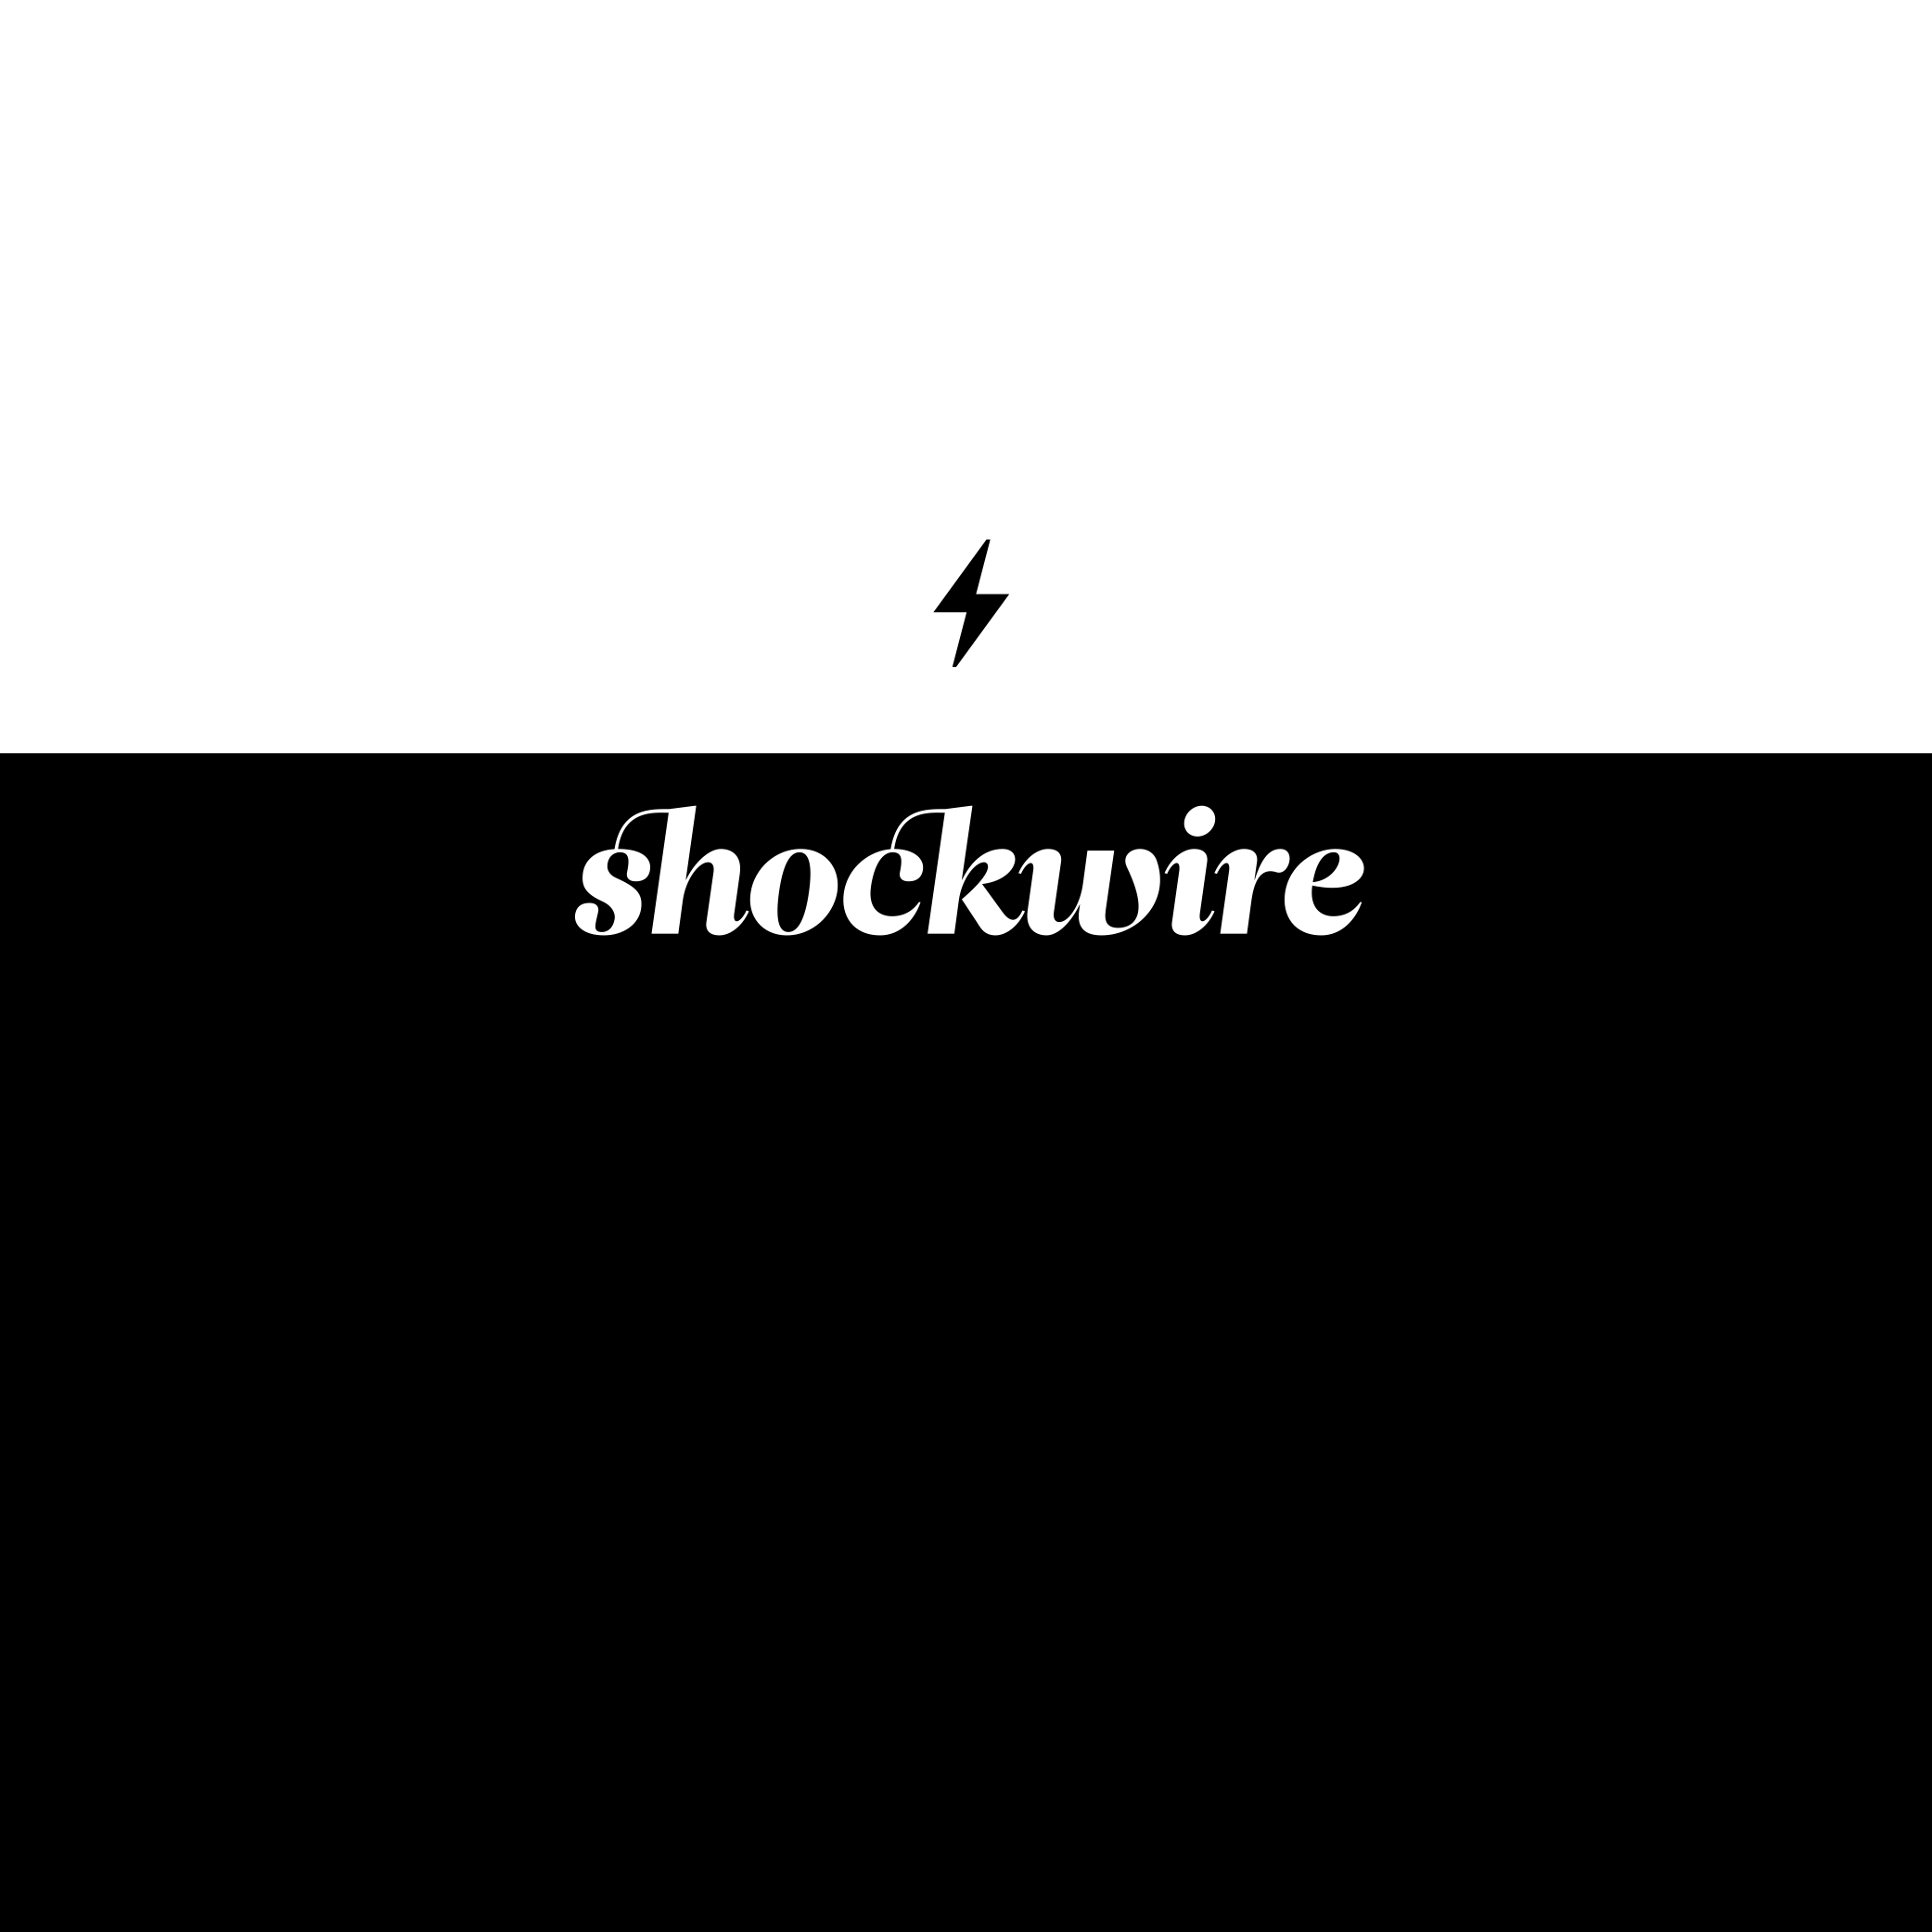 shockwire-logo-fullwordmark.png